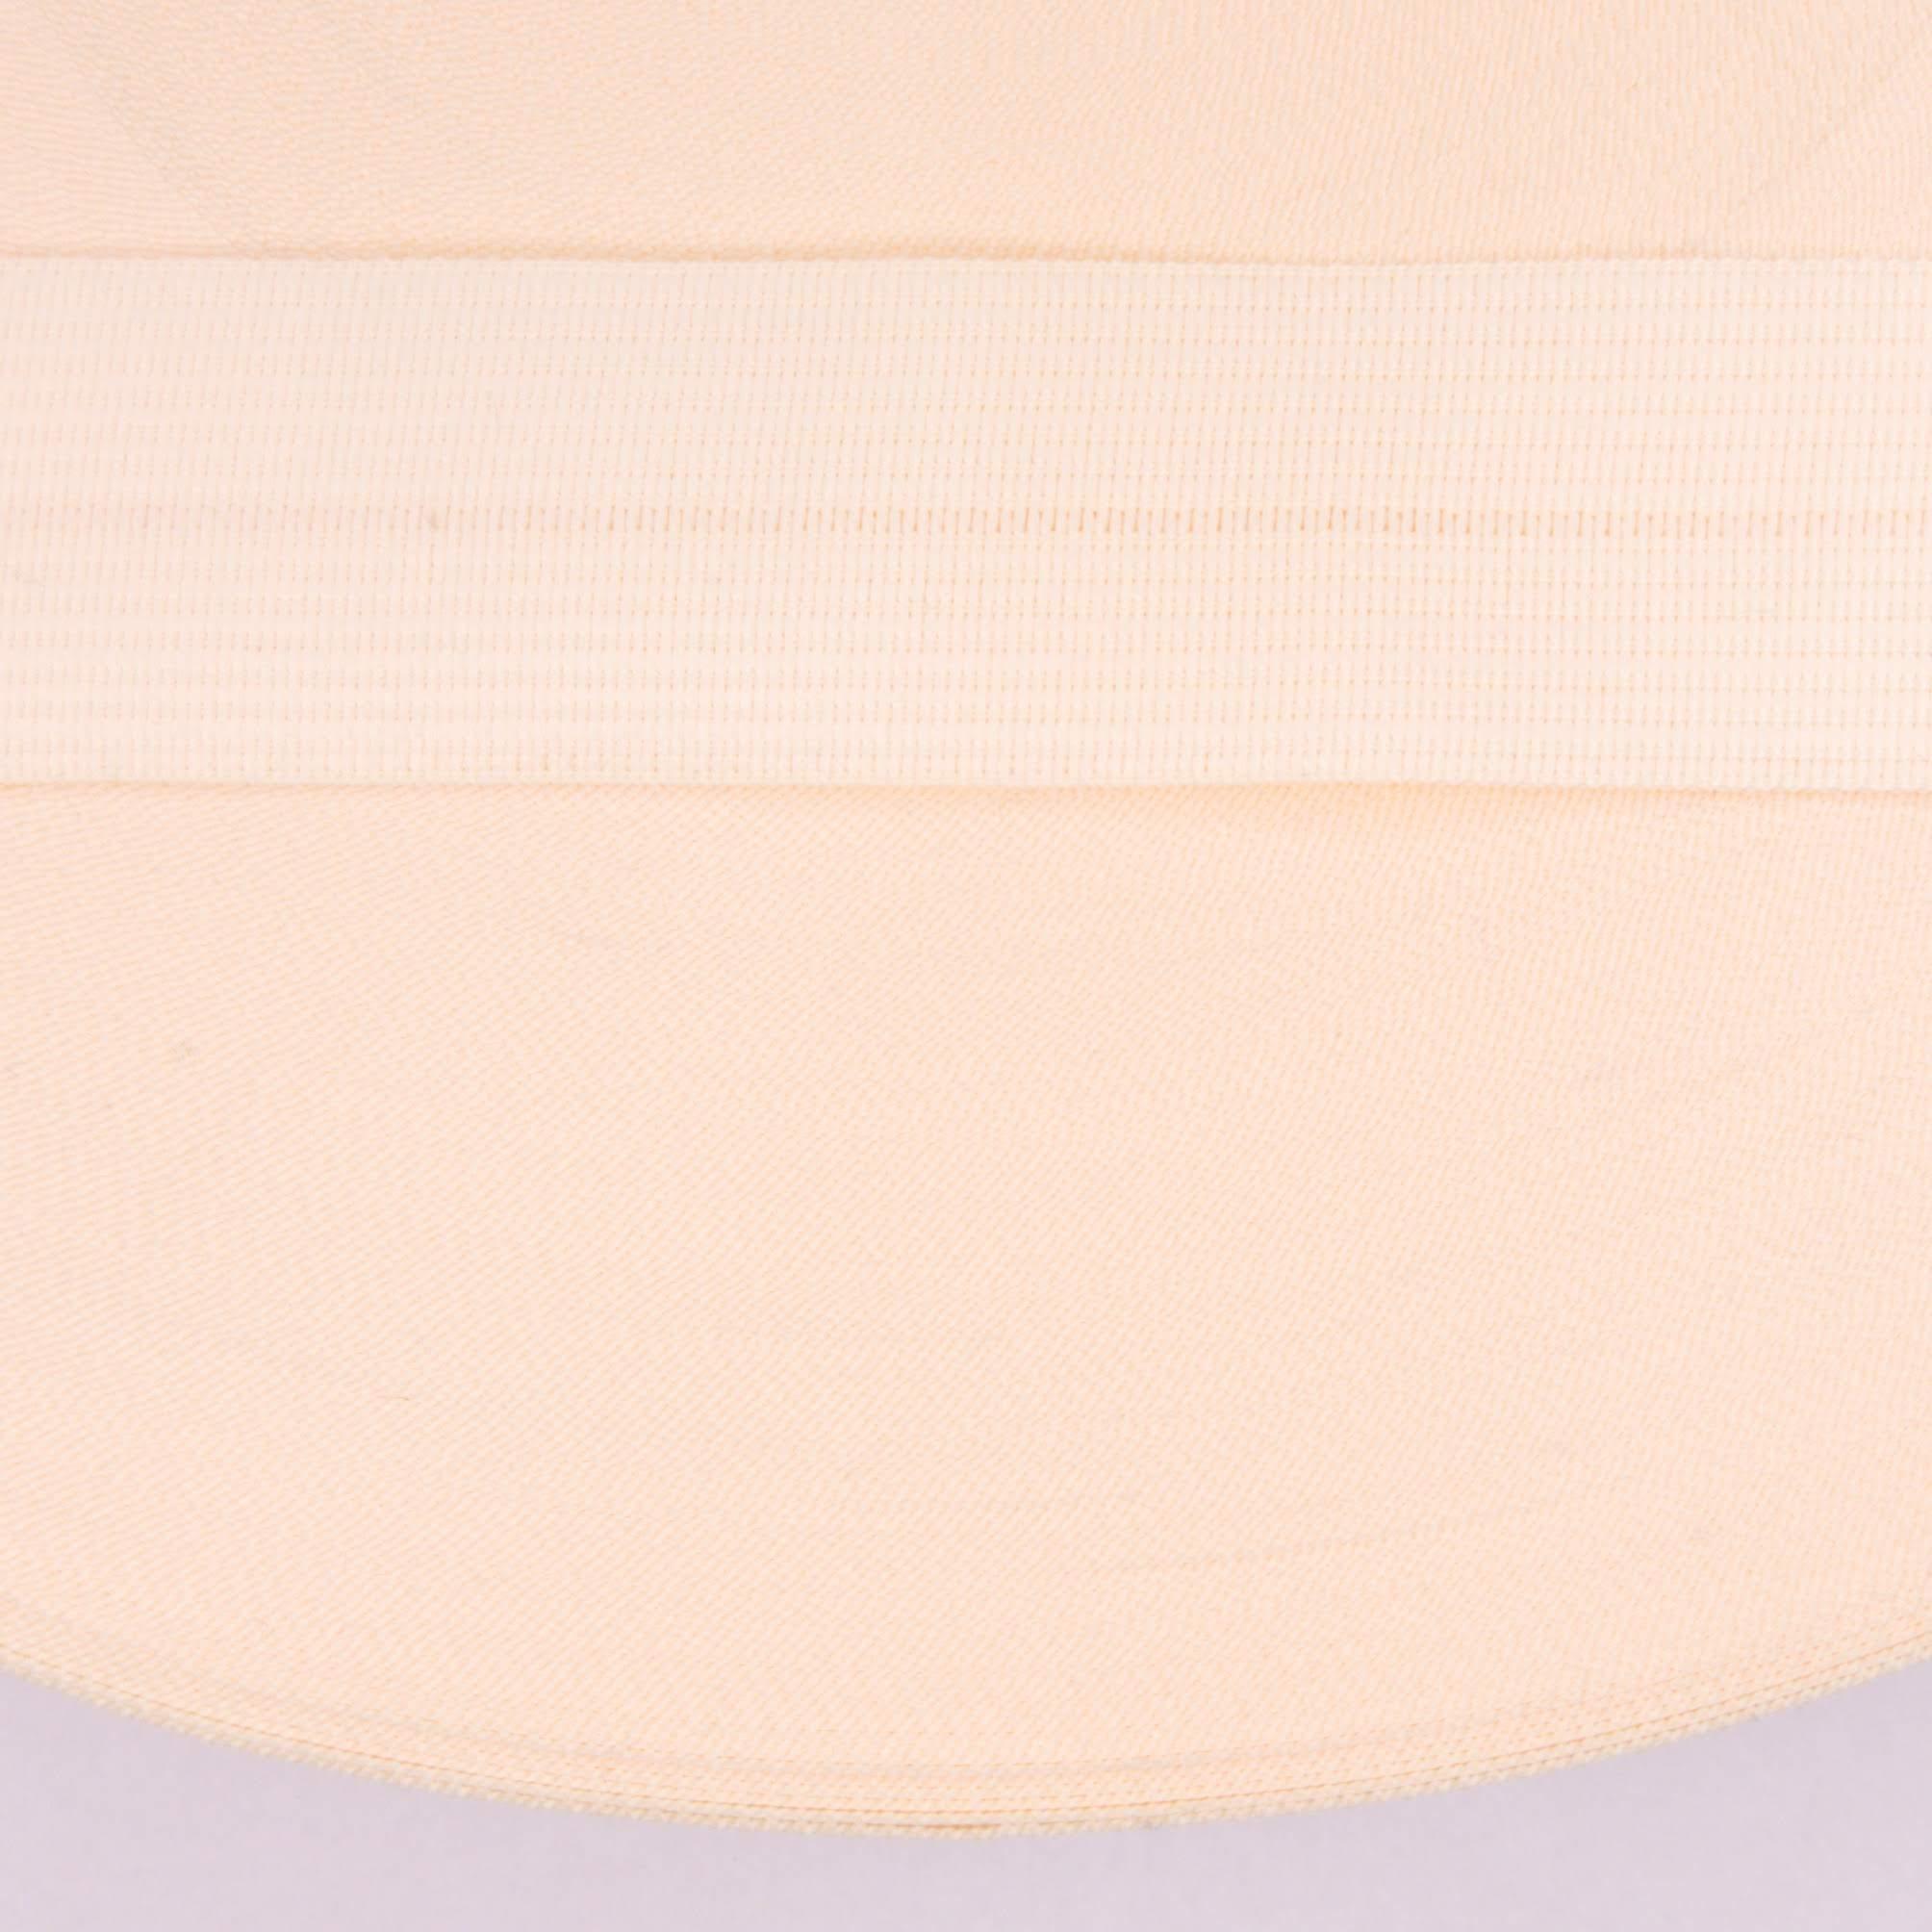 Viés Boneon Marfim c/ 5mt